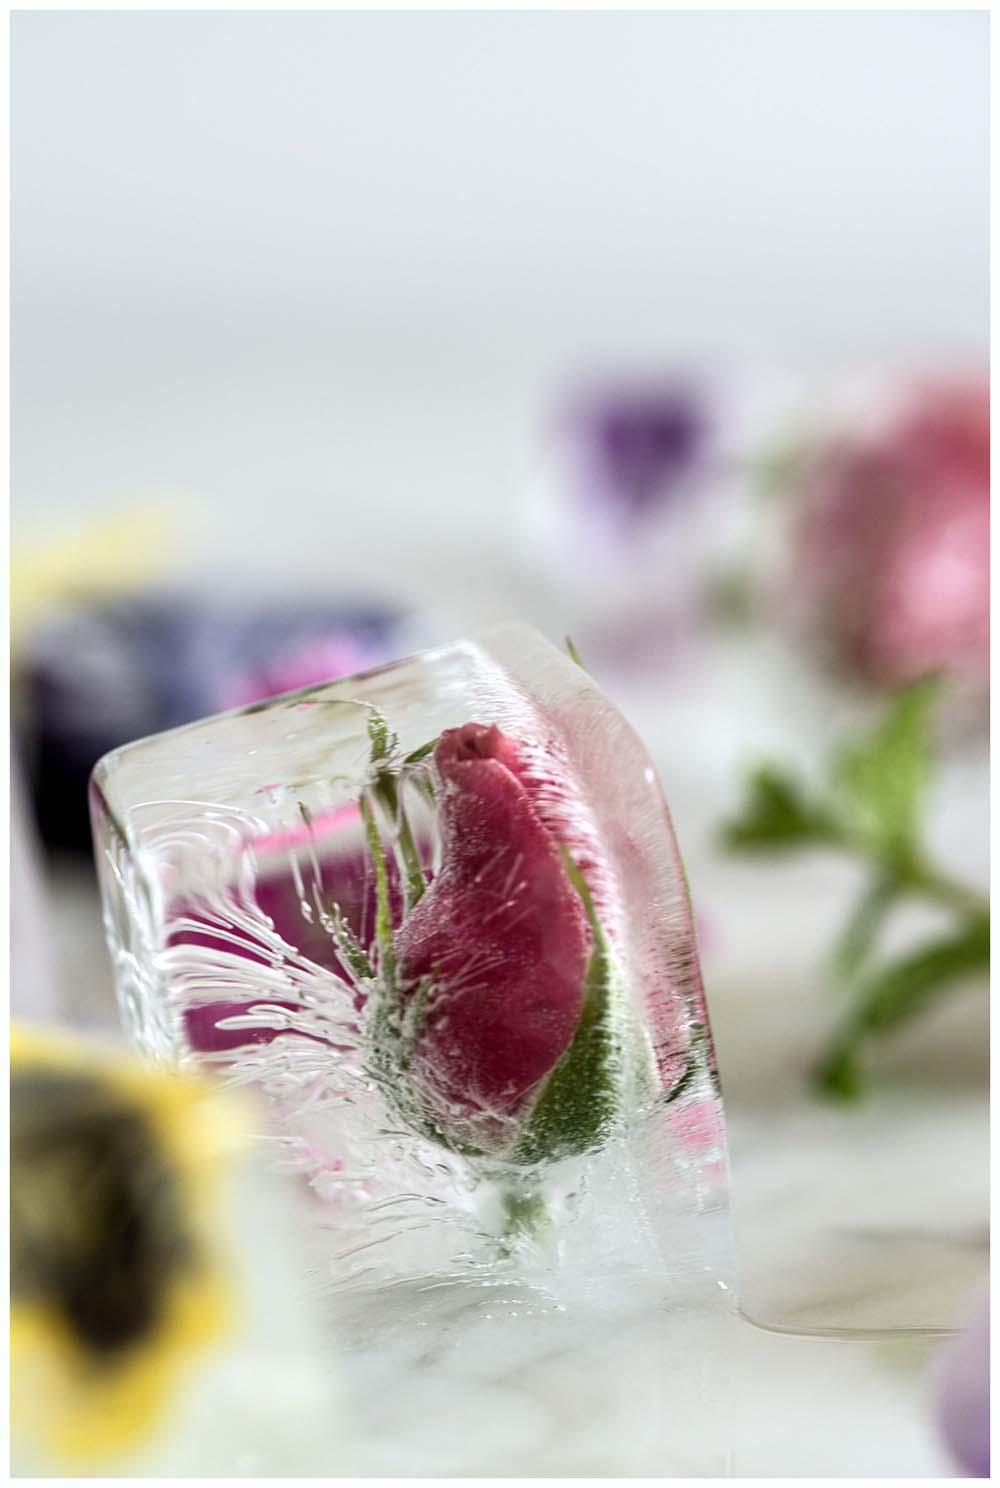 Frozen Rose Ice Cube